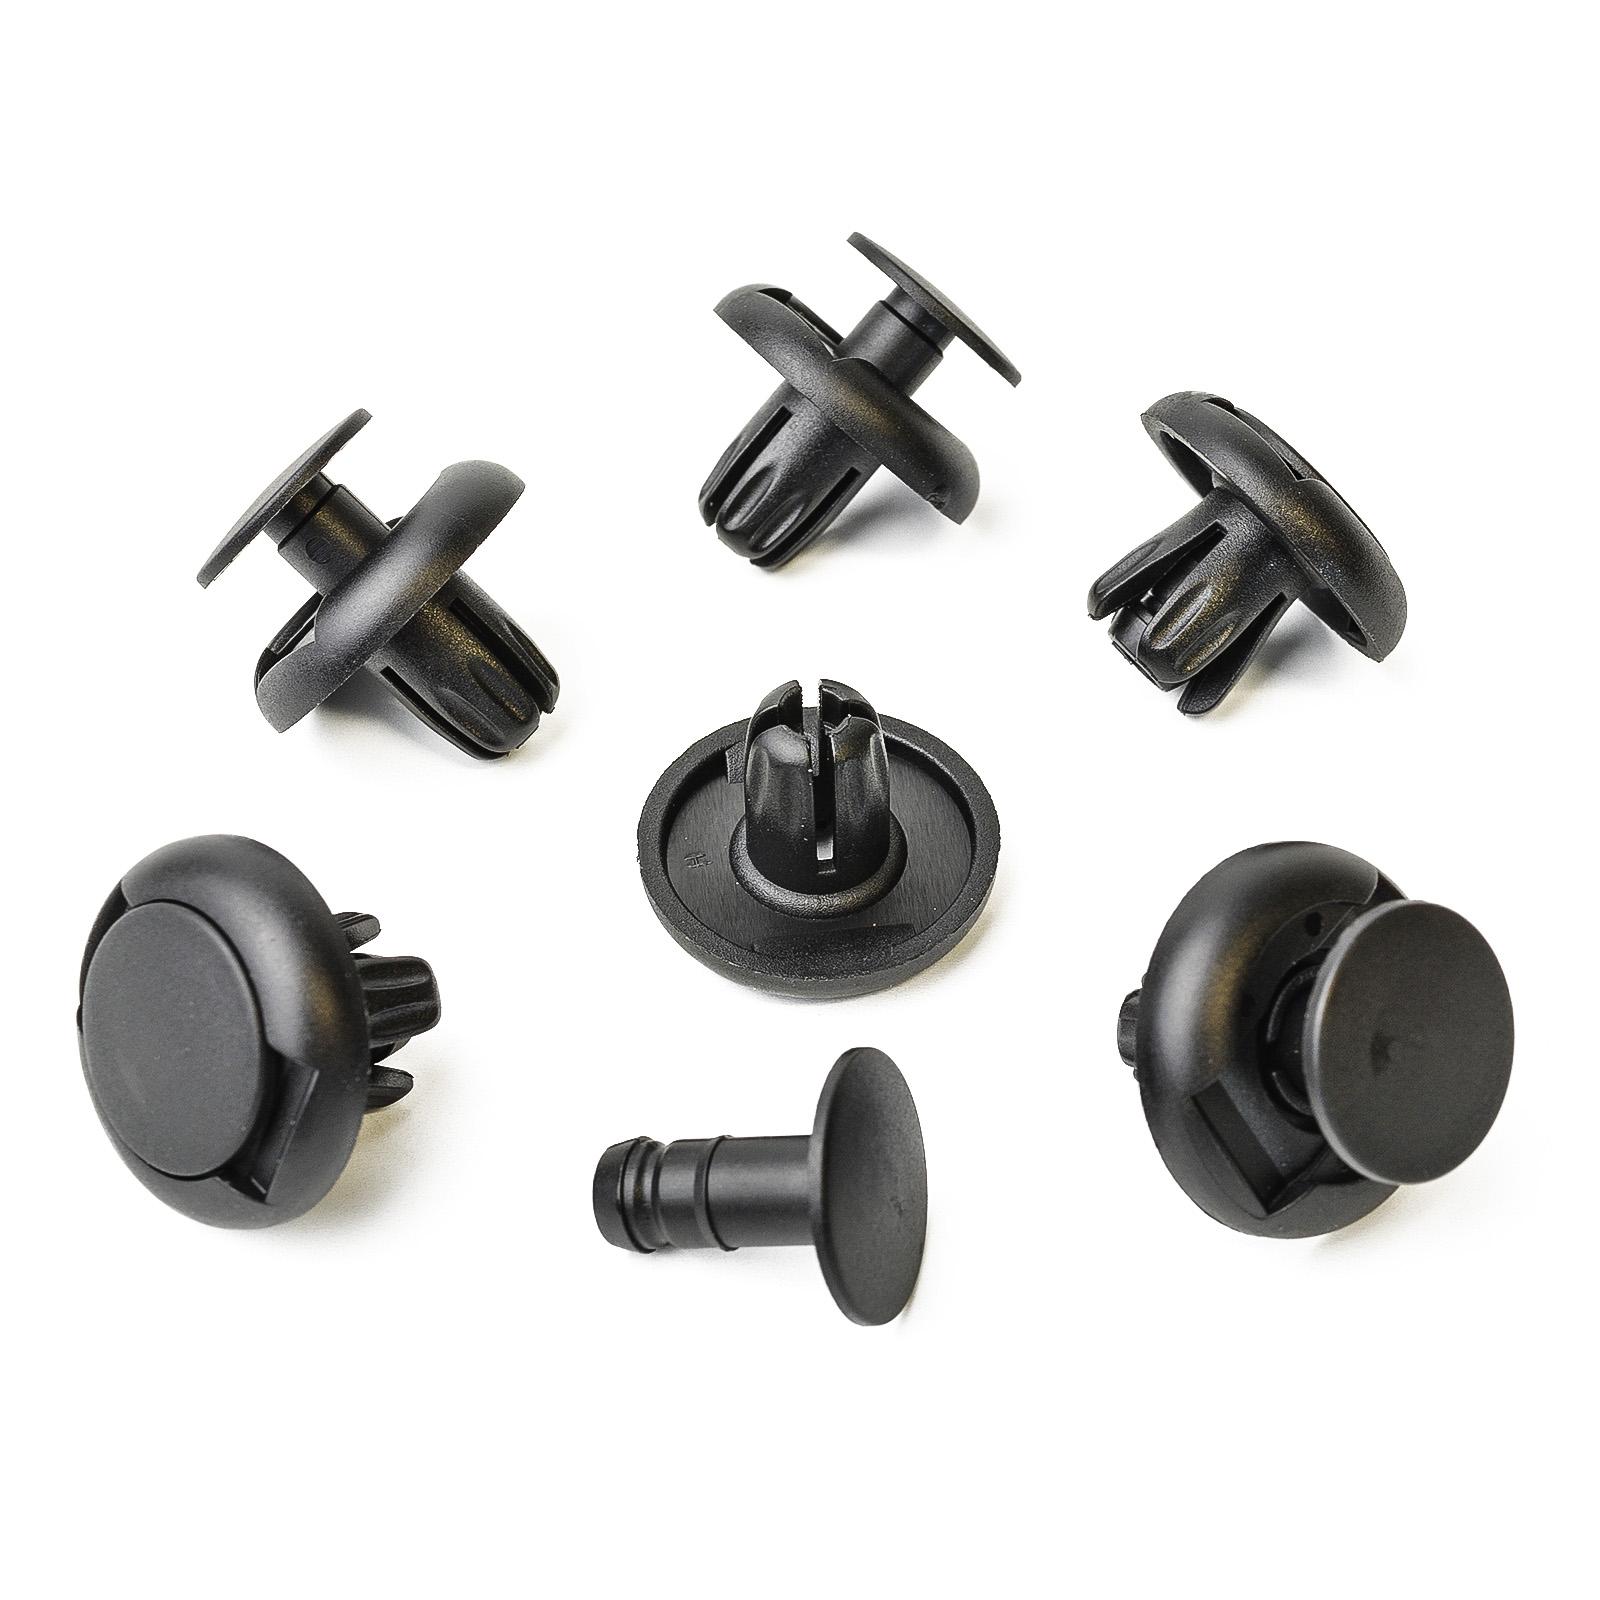 6 Gr/ö/ßen 100 St/ück Clip Verkleidung Auto Push Pin Nieten Sto/ßstange T/ür Kotfl/ügel Panel Retainer Sortiment